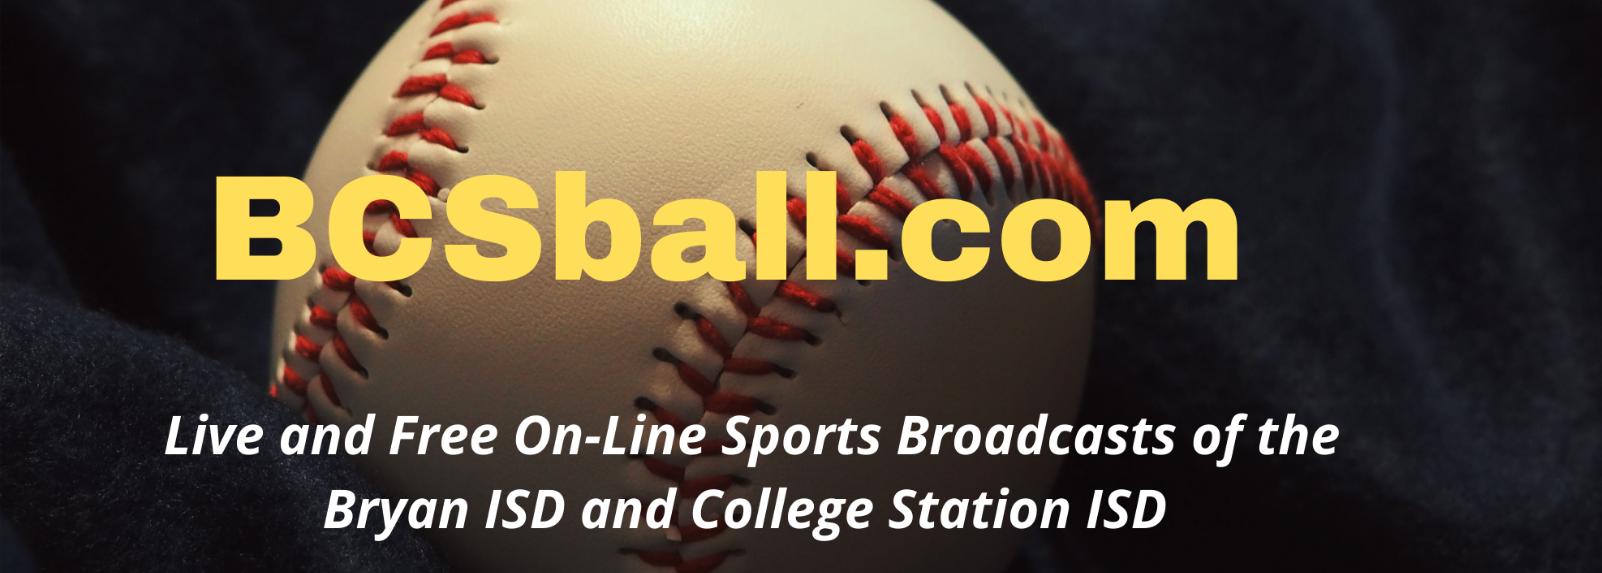 bcsBALL.com